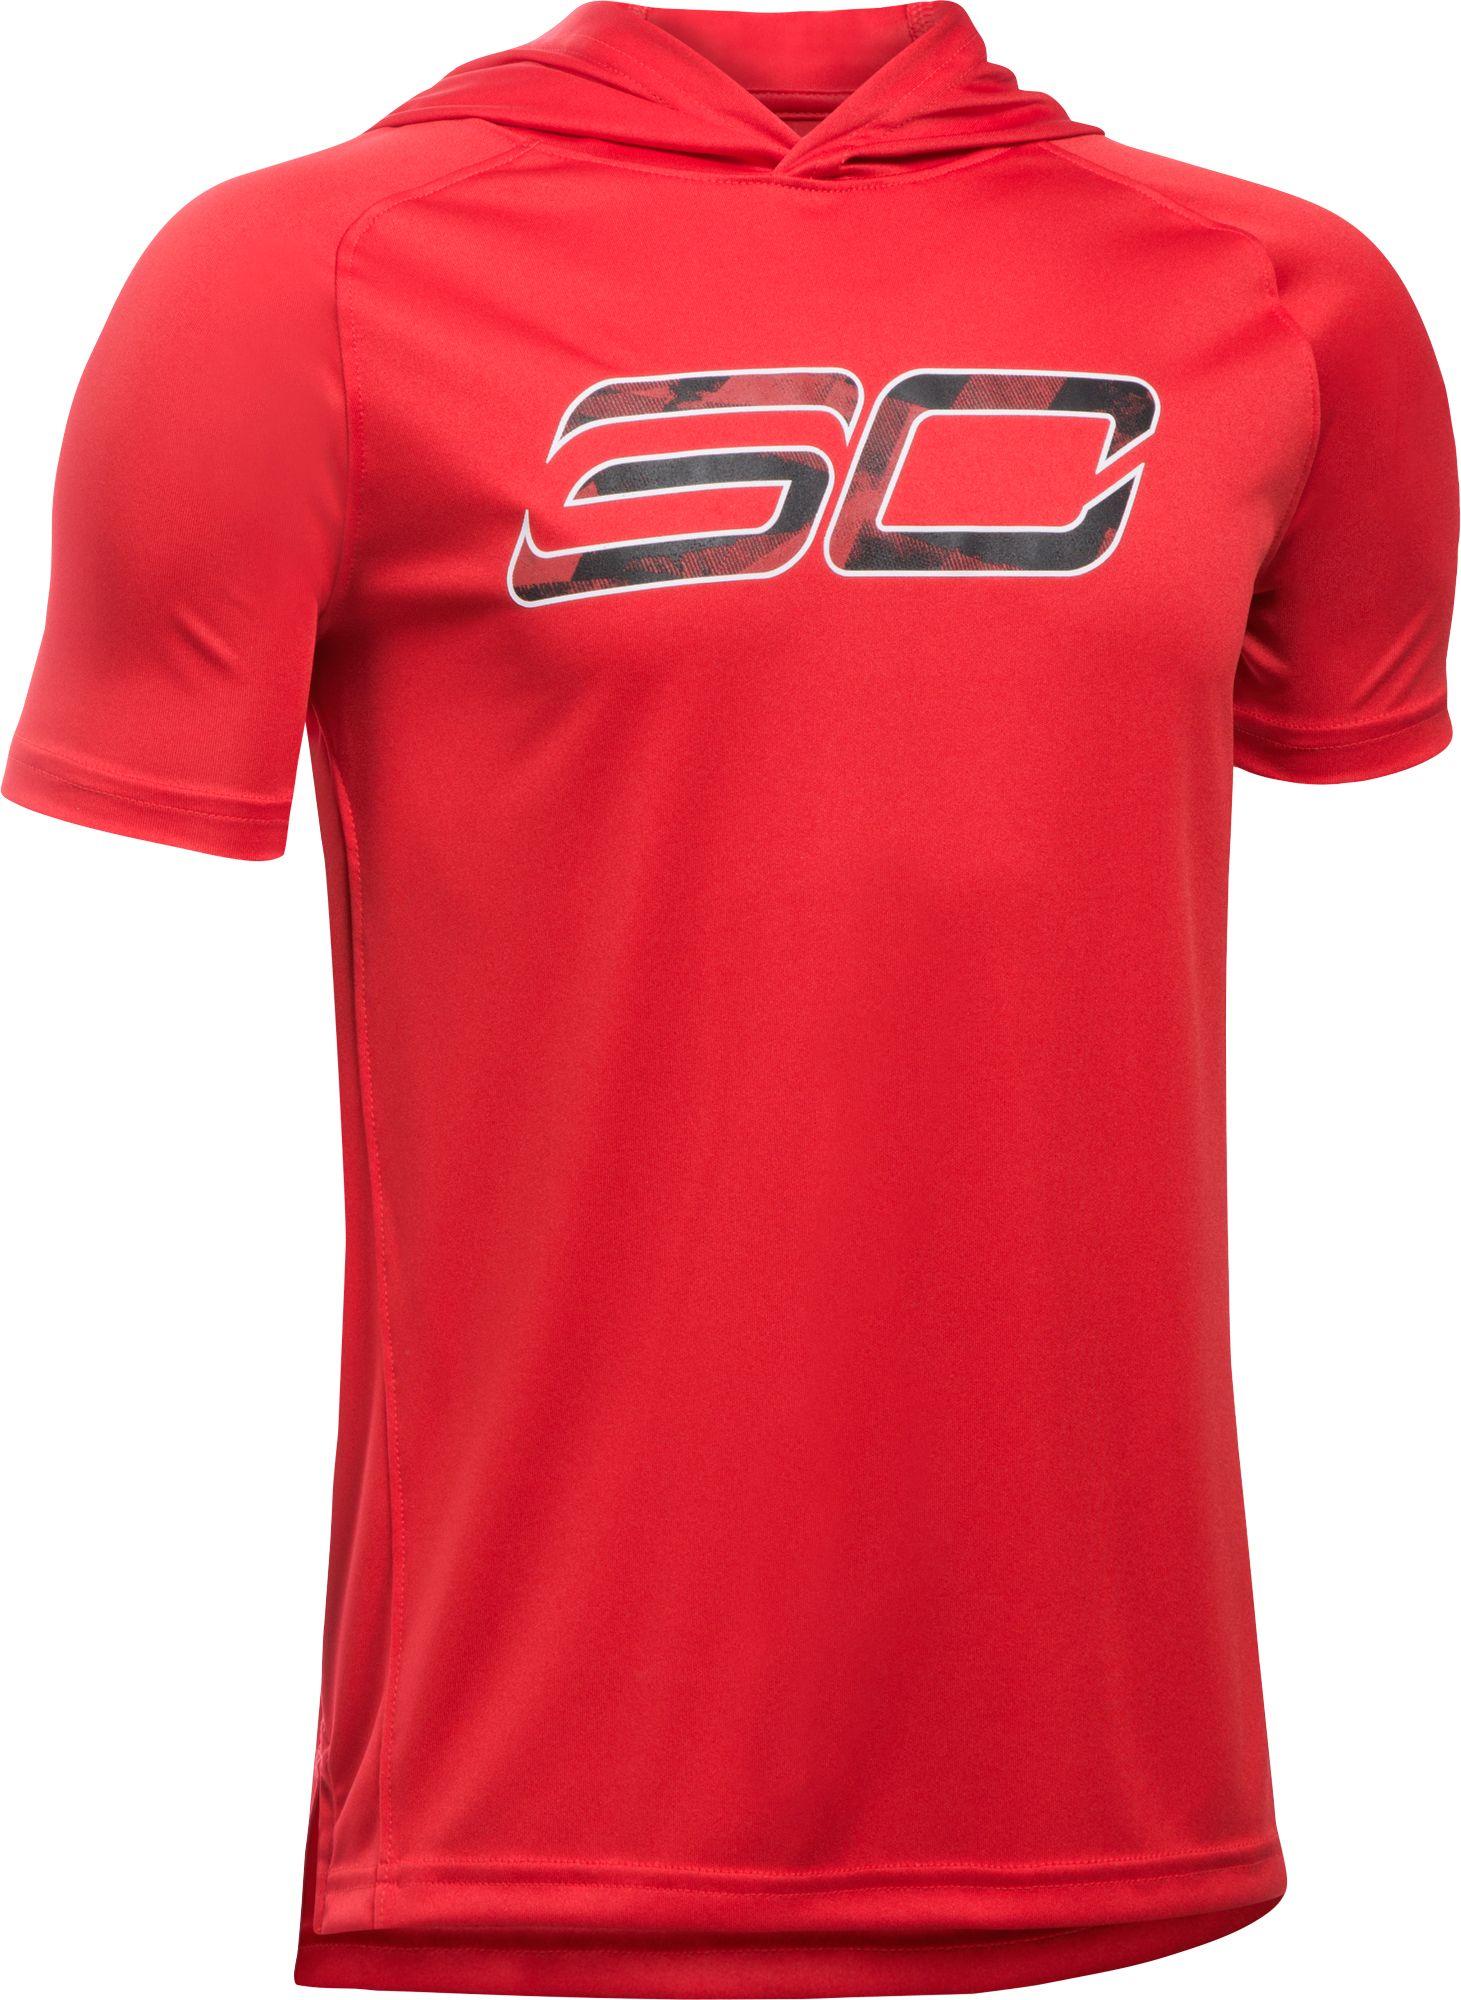 Under Armour Boys' SC30 Essentials Short Sleeve Hoodie | DICK'S ...